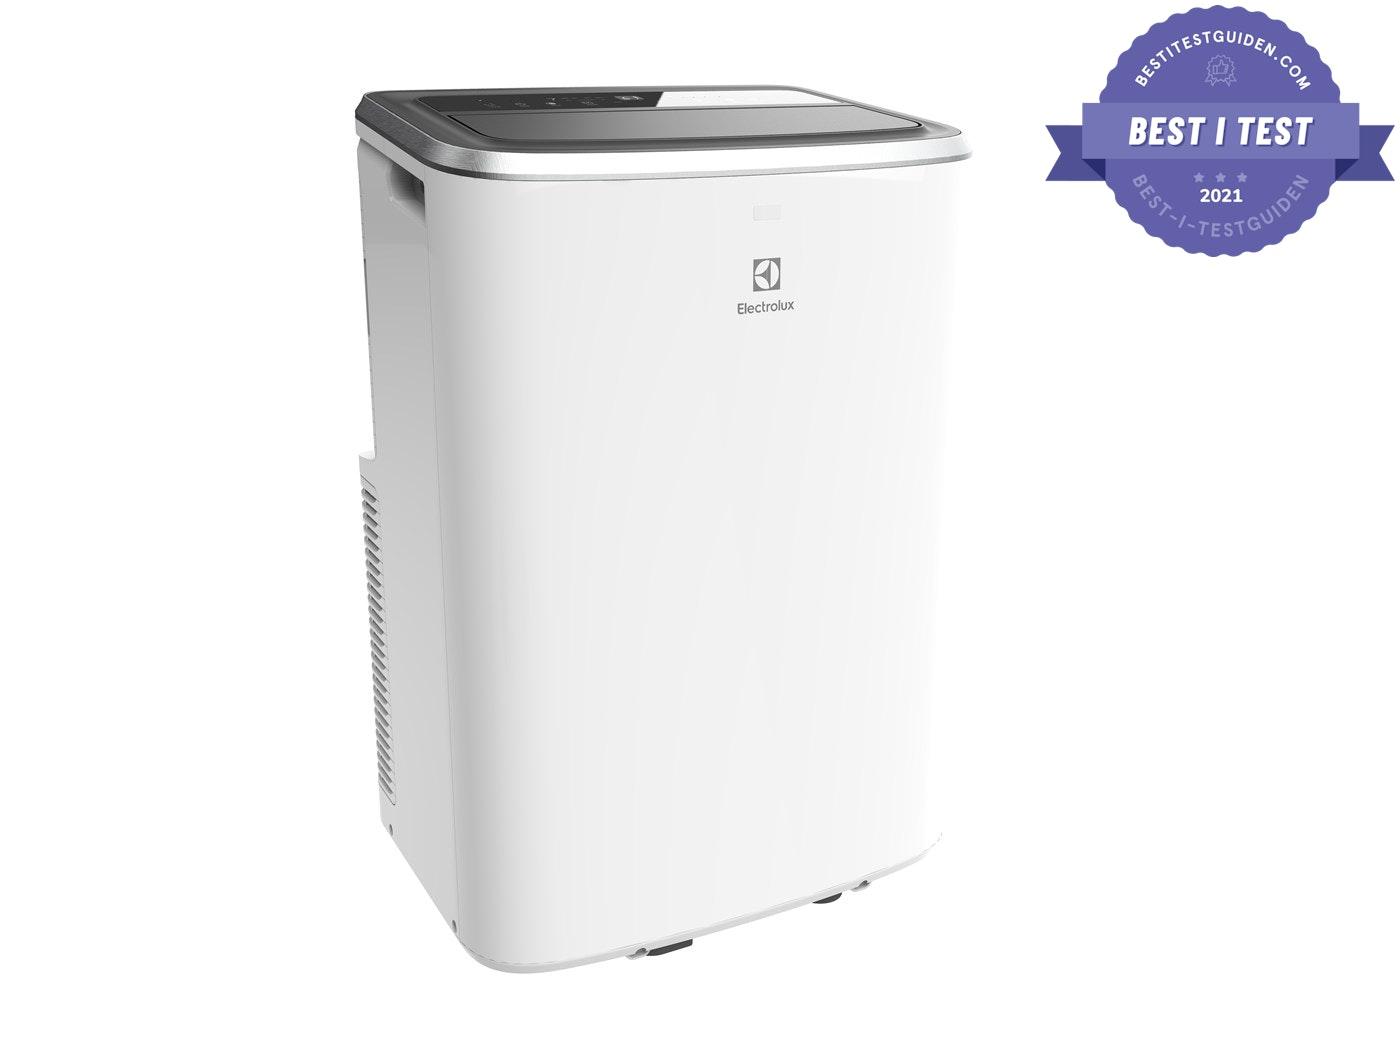 Beste portable aircondition 2020 – Electrolux EXP26U338CW